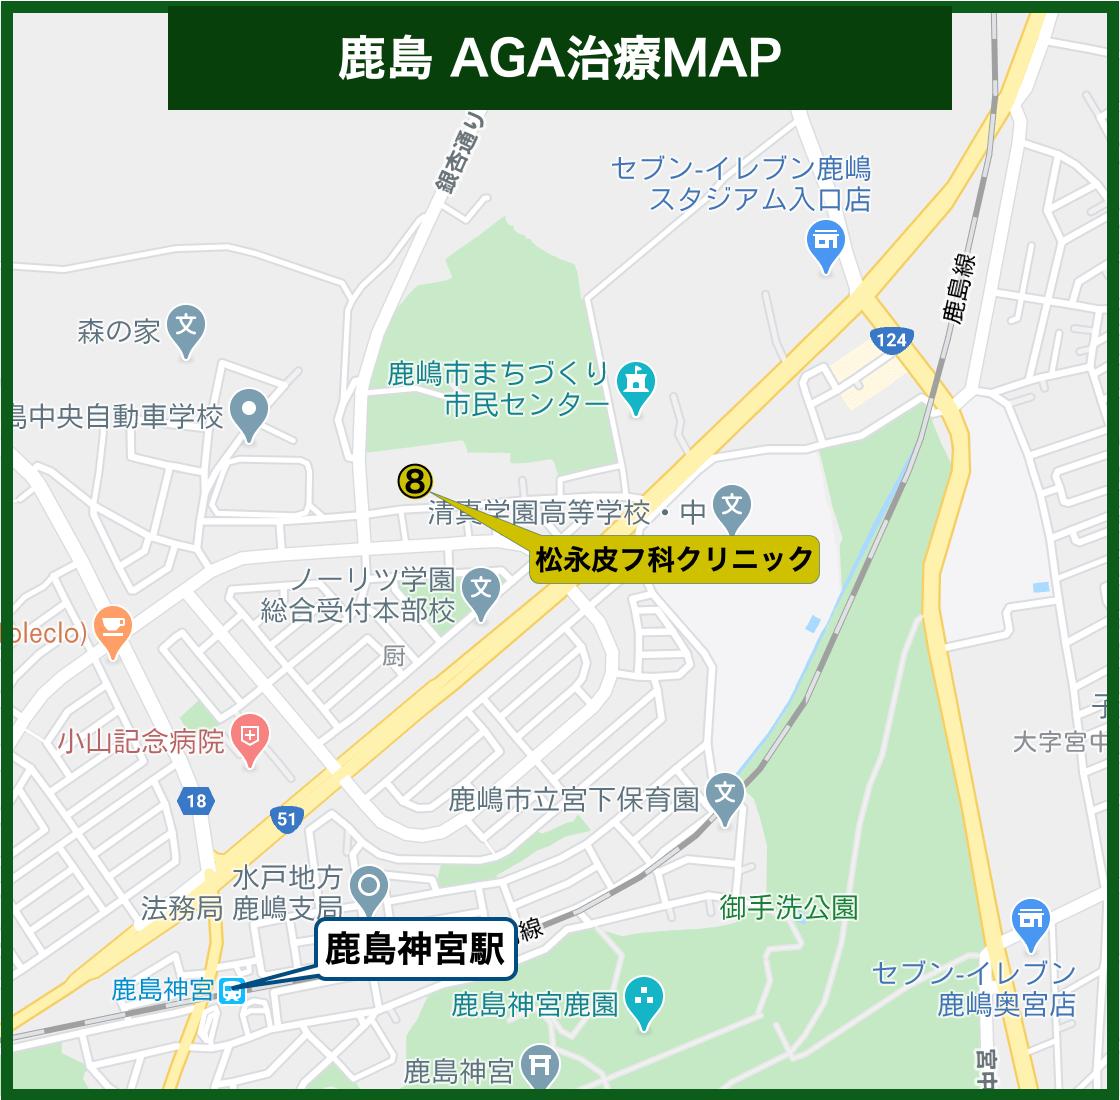 鹿島 AGA治療MAP